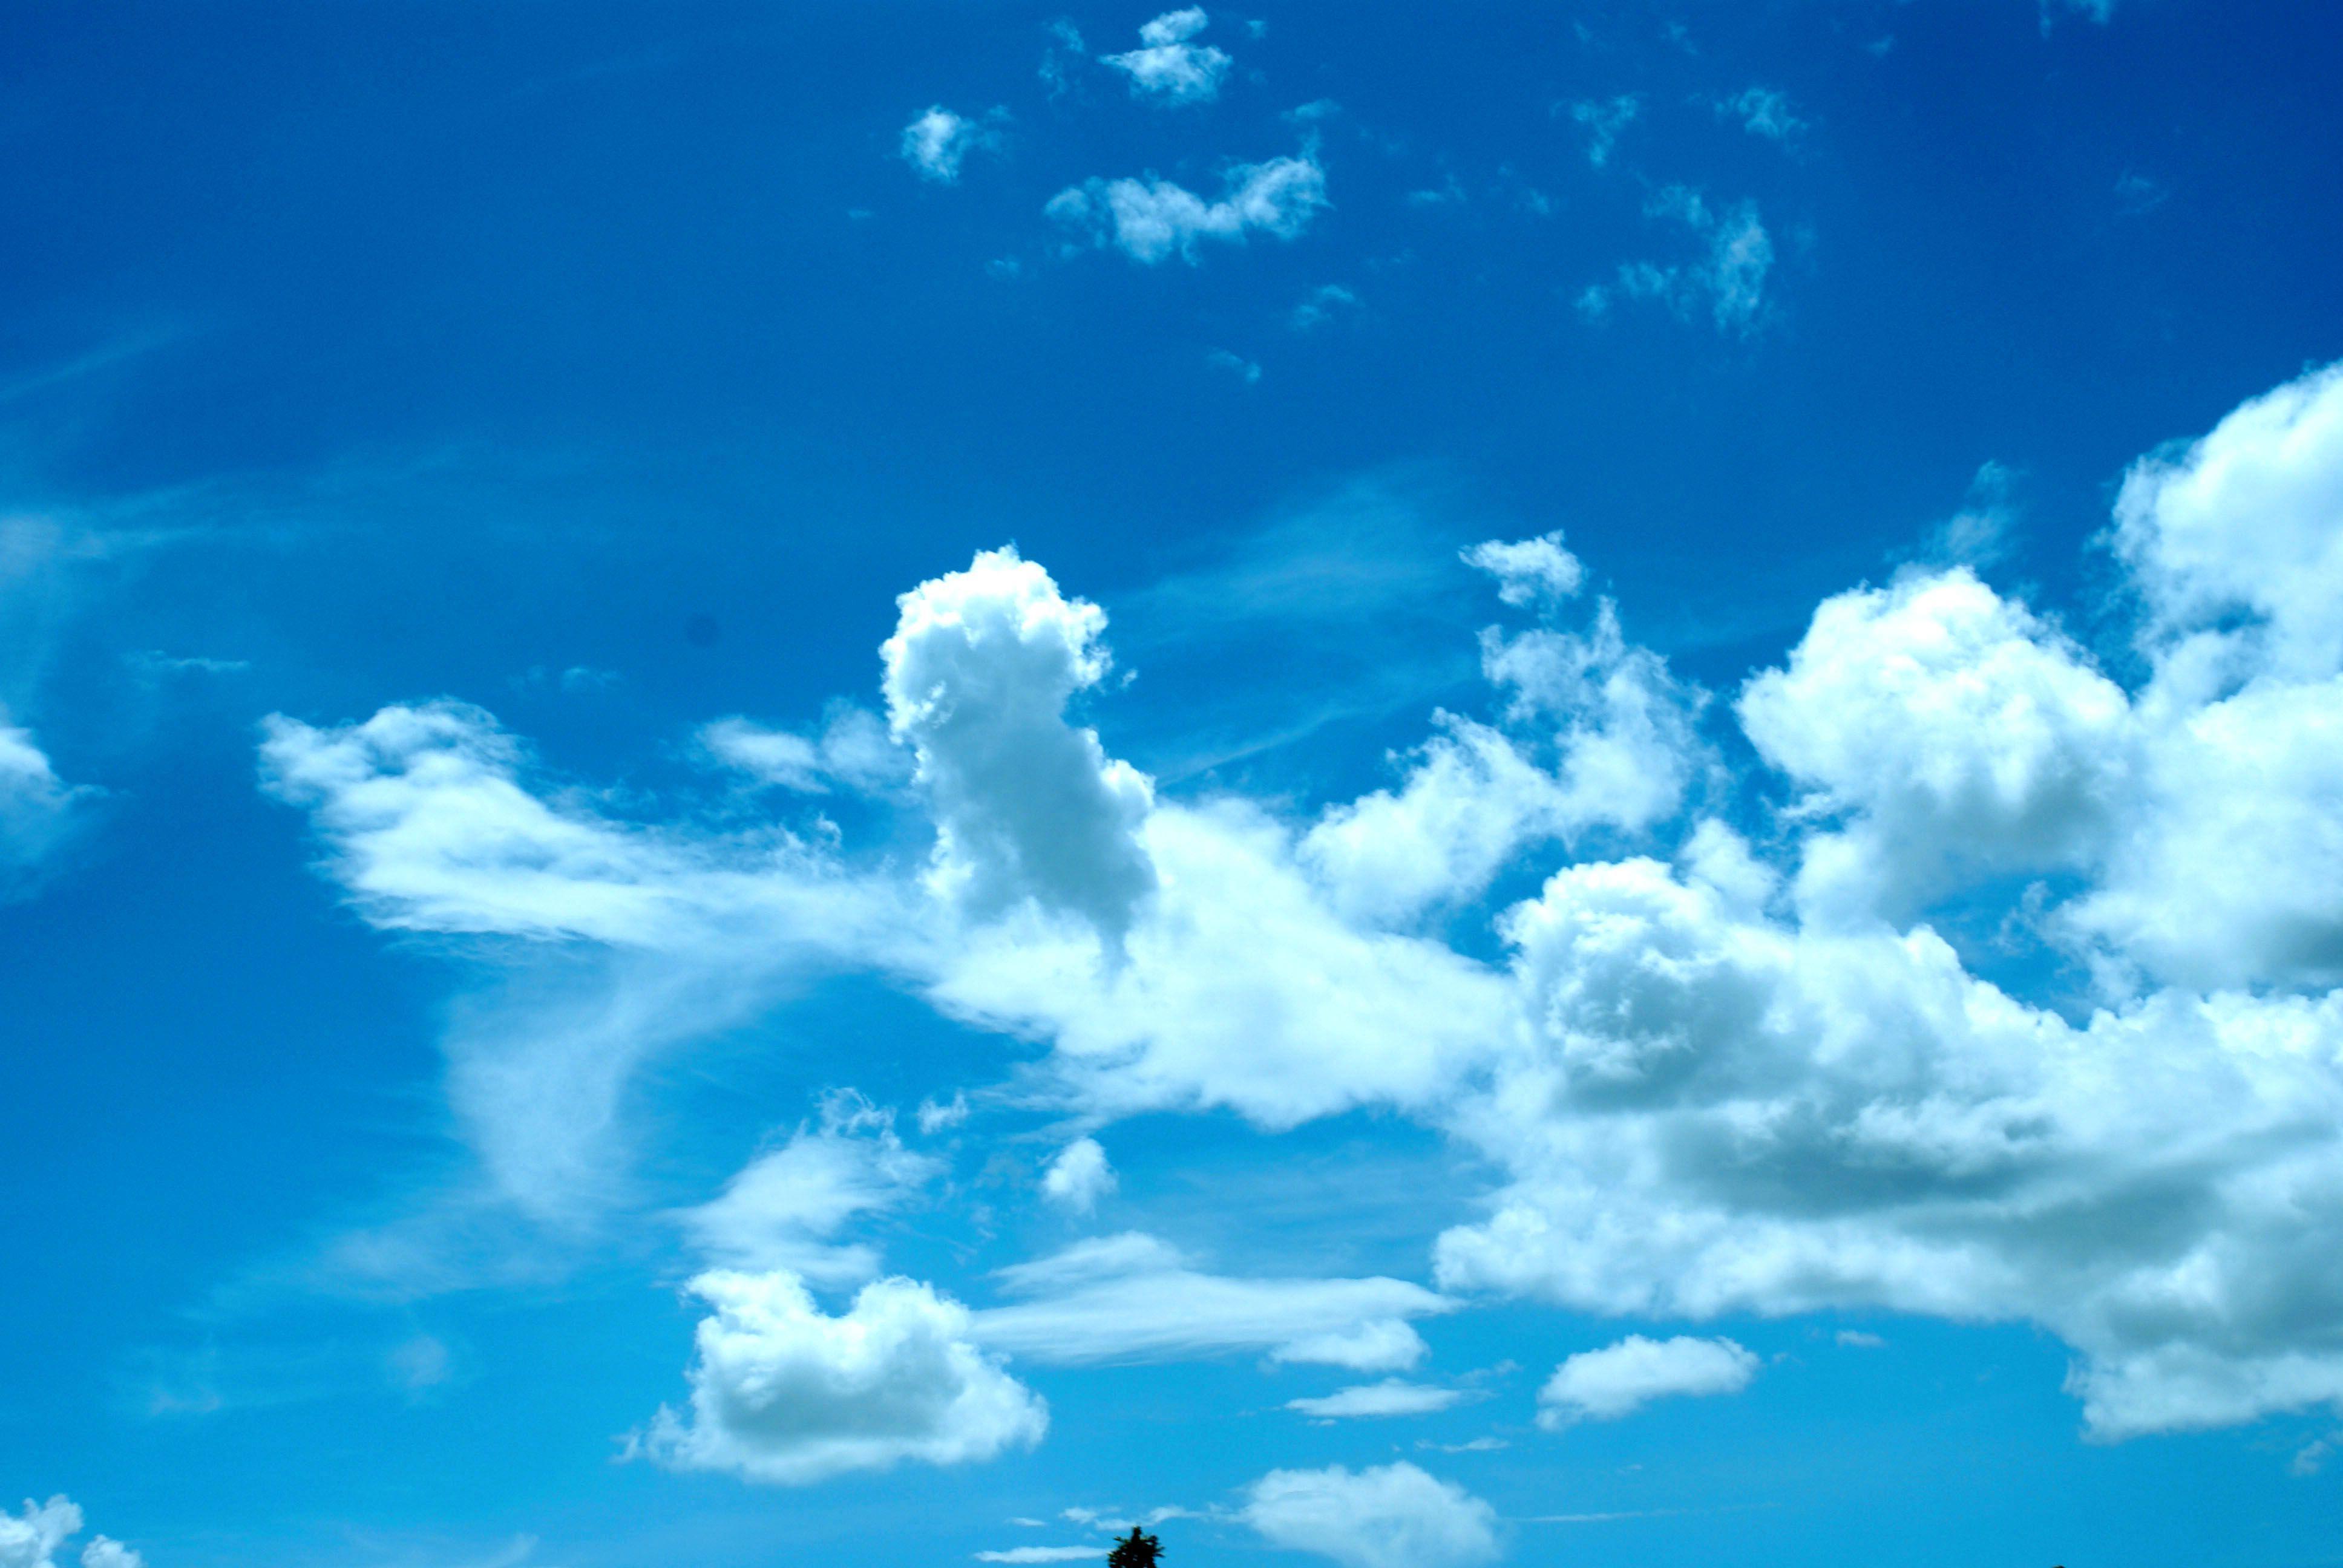 Cloud Desktop Backgrounds - Wallpaper Cave